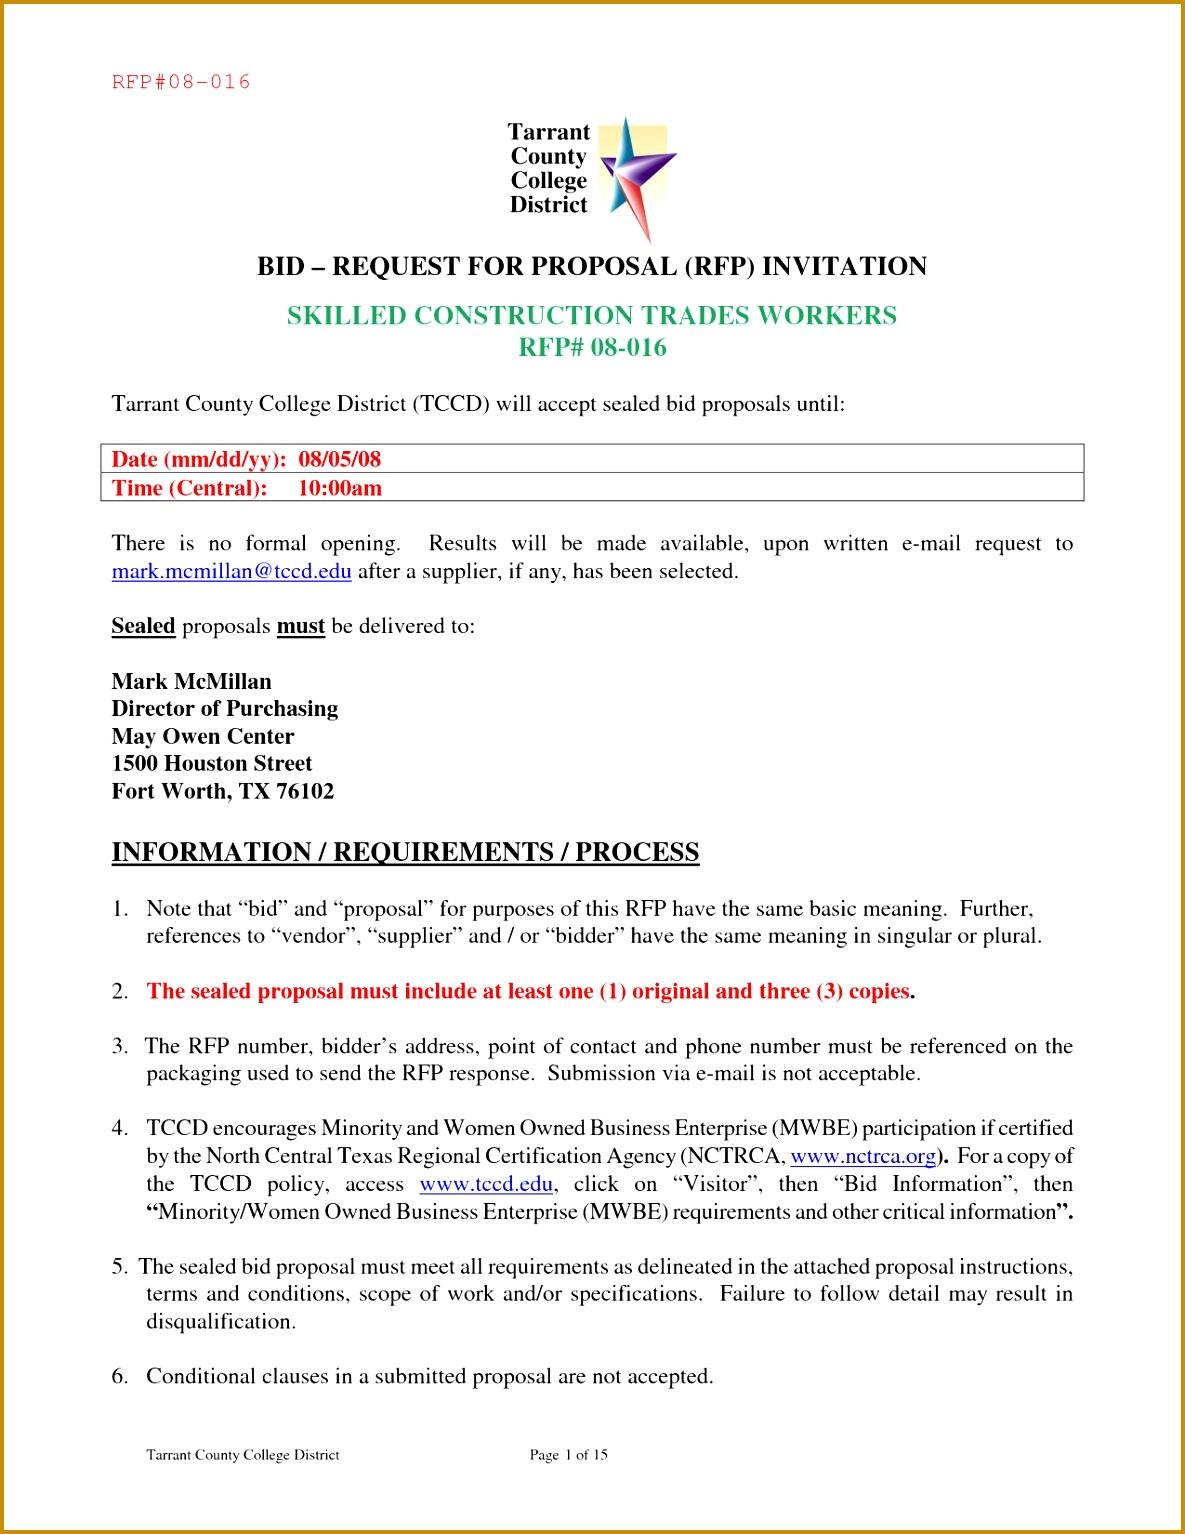 Construction Bid Proposal Sample 15341185